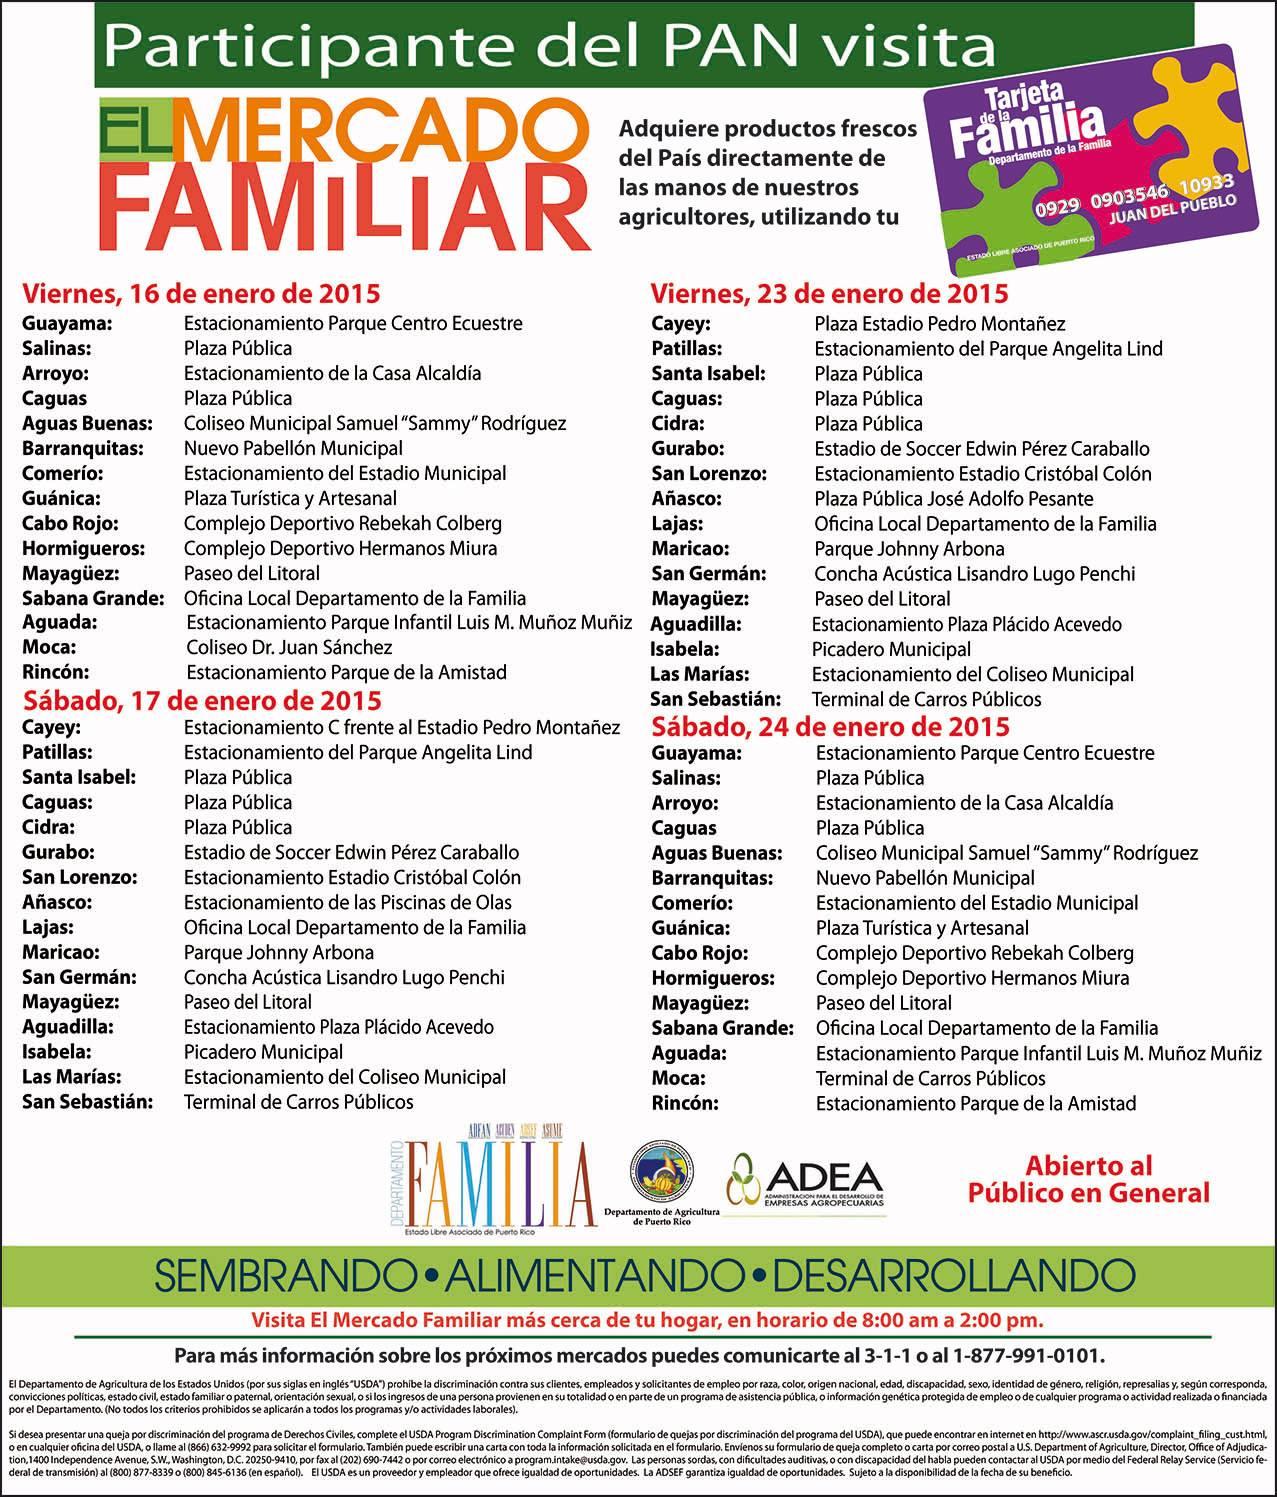 Mercado familiar son de aqui pr for Actividades jardin botanico caguas